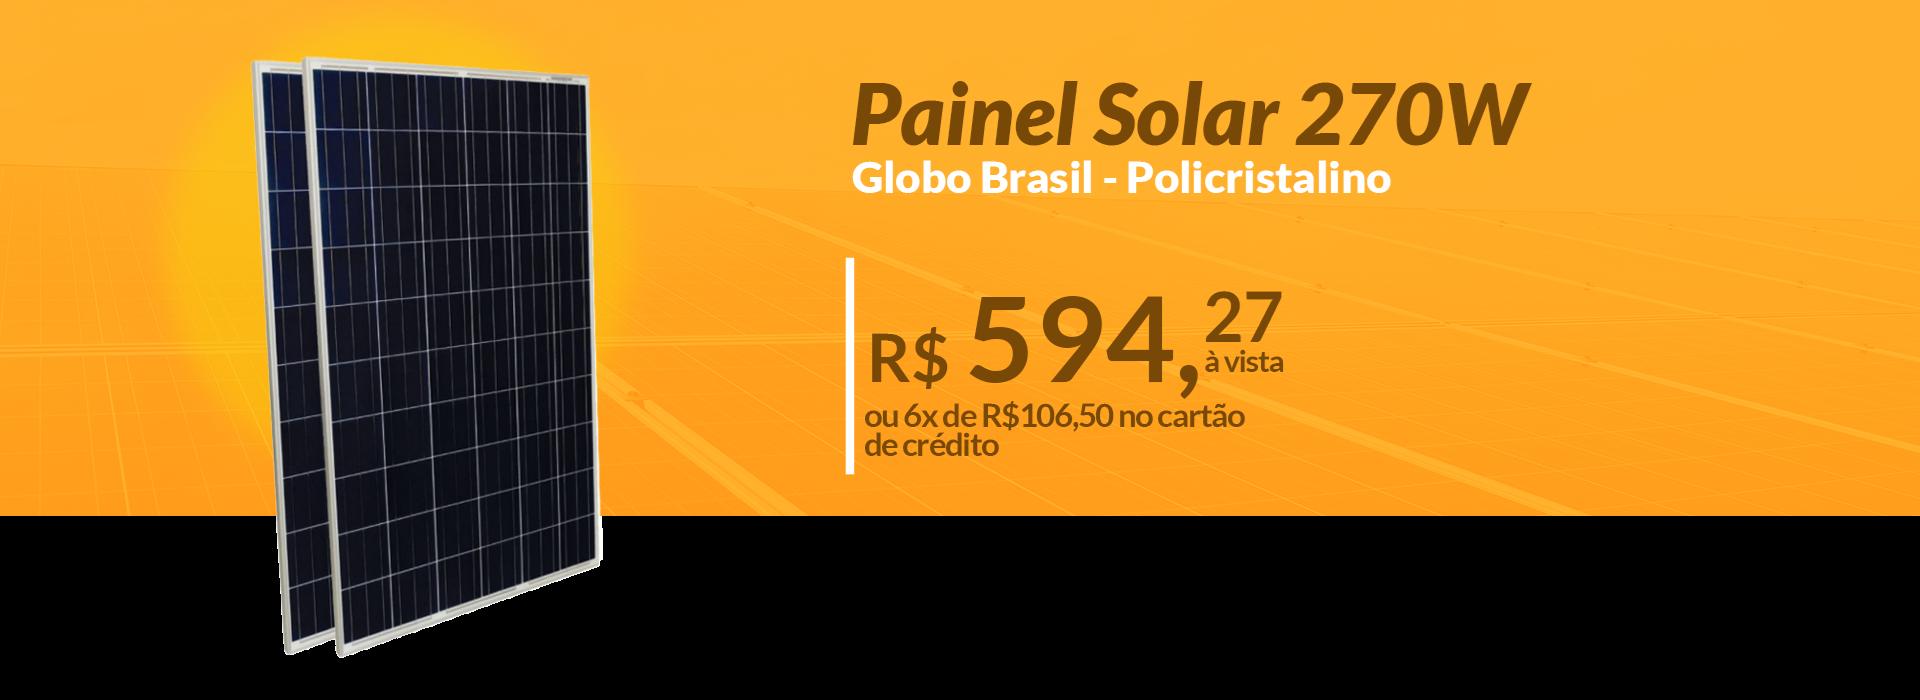 Painel Globo Brasil 270